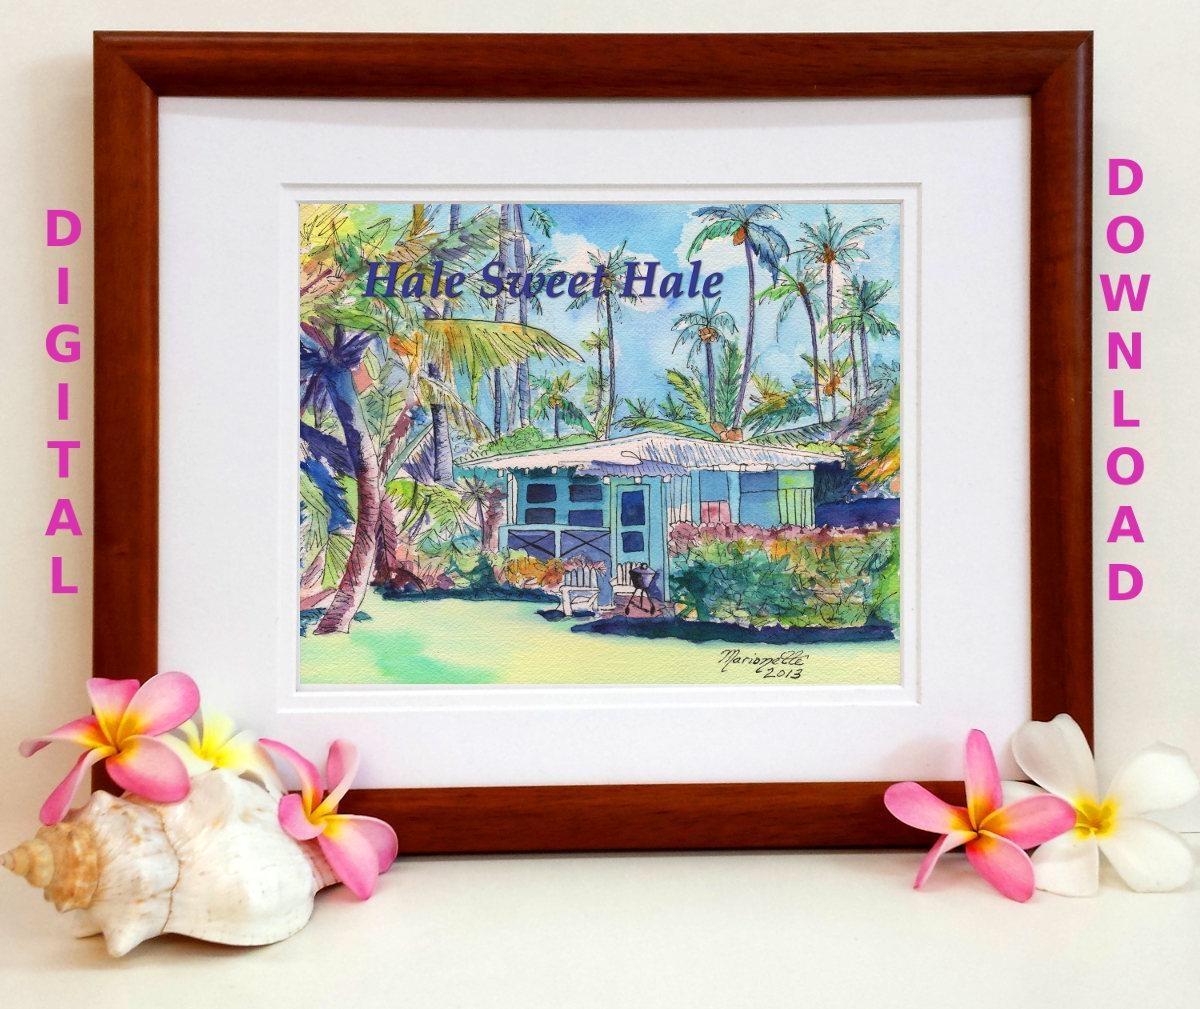 Hawaiian Quotes Digital Art Prints 8X10 And 5X7 Printable Wall Art throughout Hawaiian Wall Art Decor